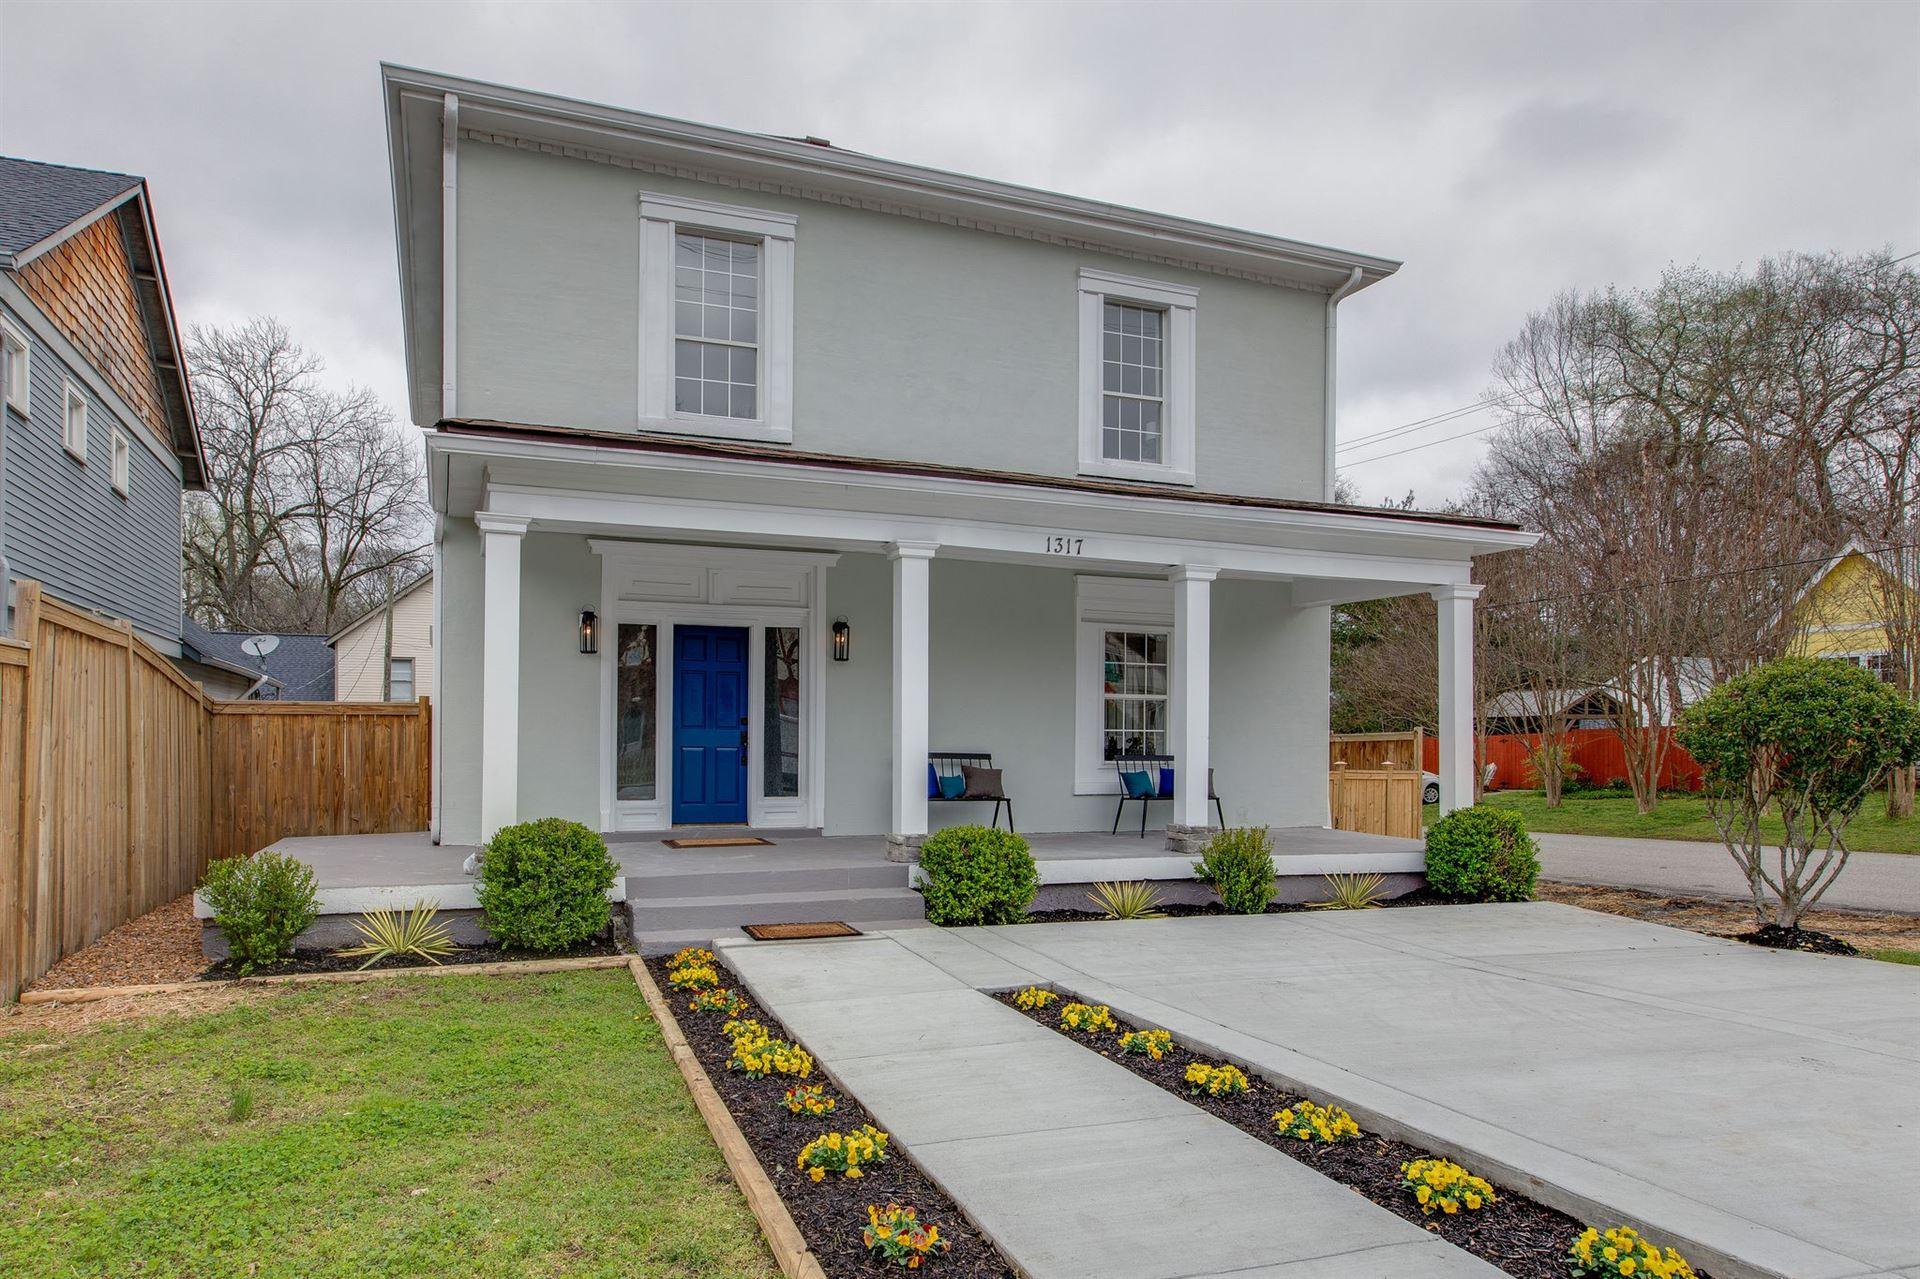 1317 Greenwood Ave, Nashville, TN 37206 - MLS#: 2182633